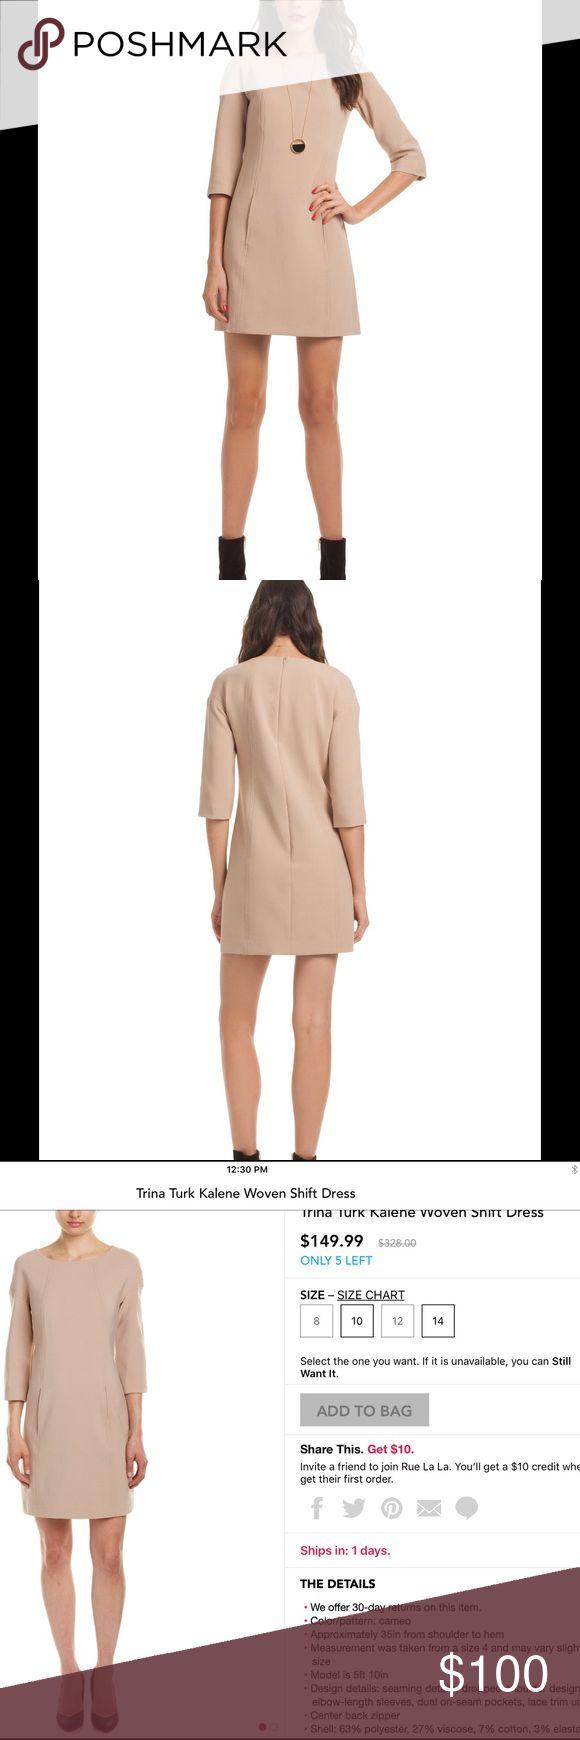 NWT Trina Turk Kalene Dress Fun dress for work or play! Fully-lined. Zip back. Trina Turk Dresses